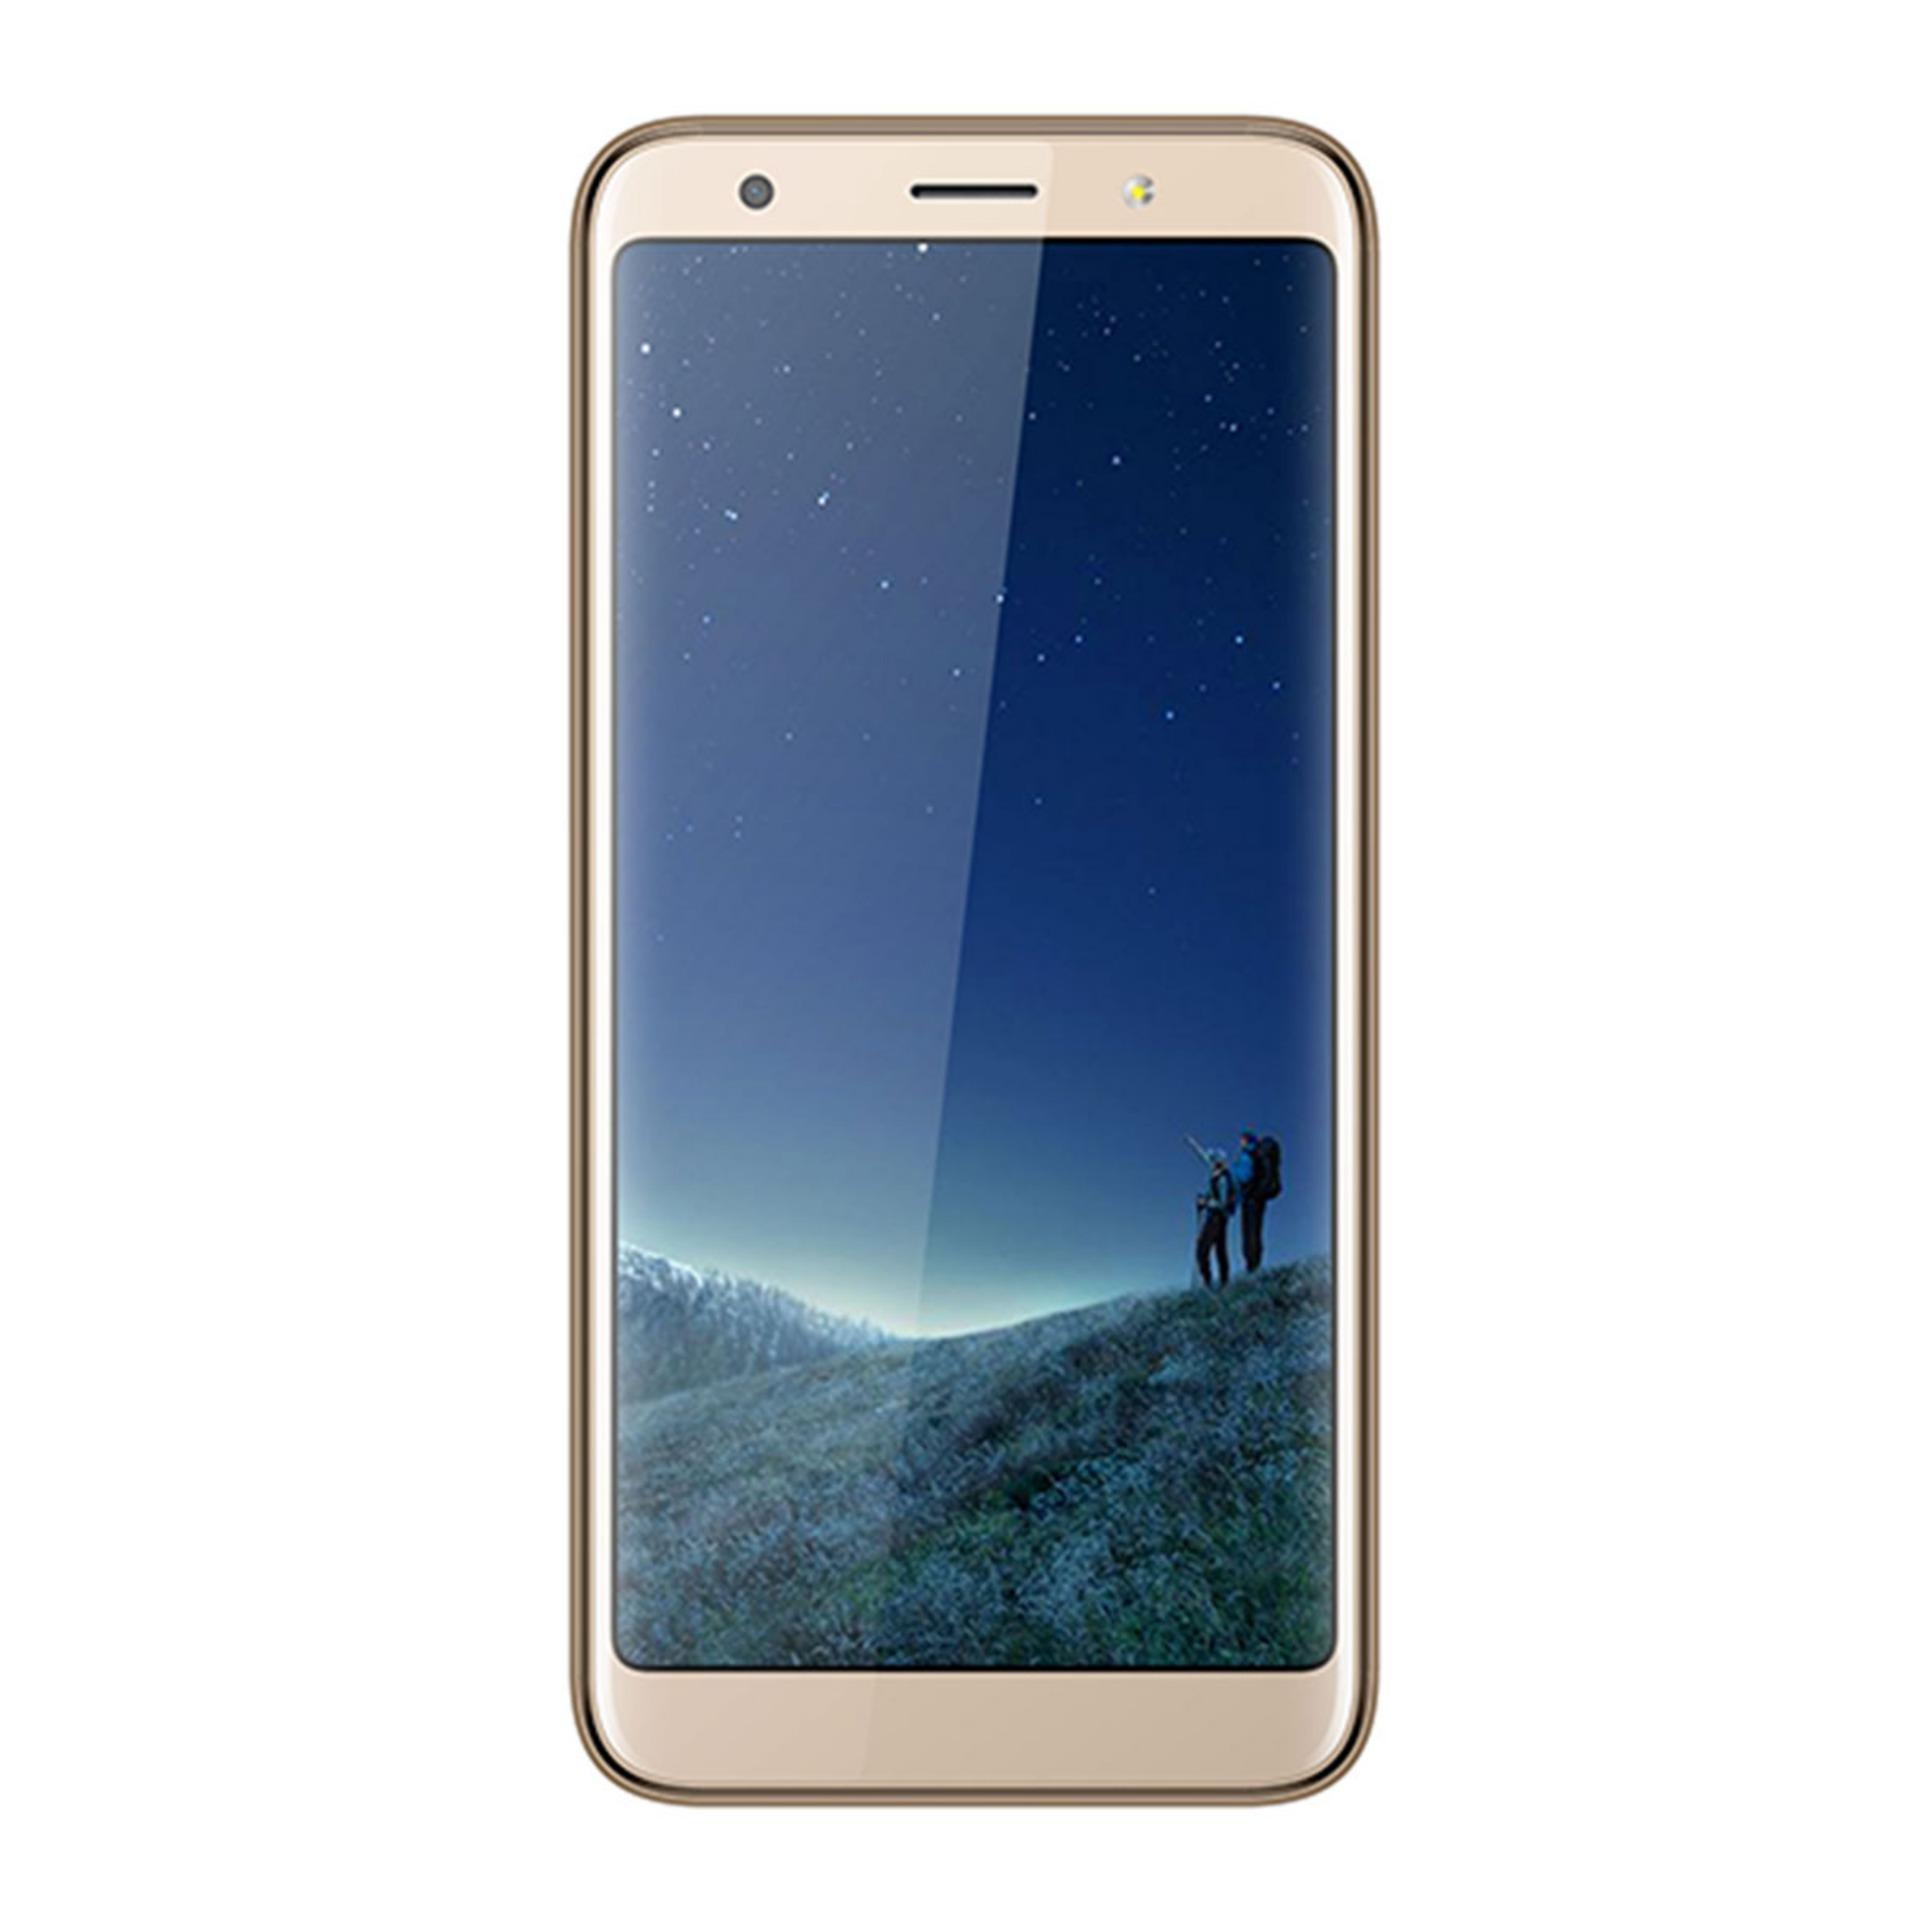 "Symphony i120 - Smartphone - 5 45"" - 2GB RAM - 16GB ROM - 13MP Camera - Gold"